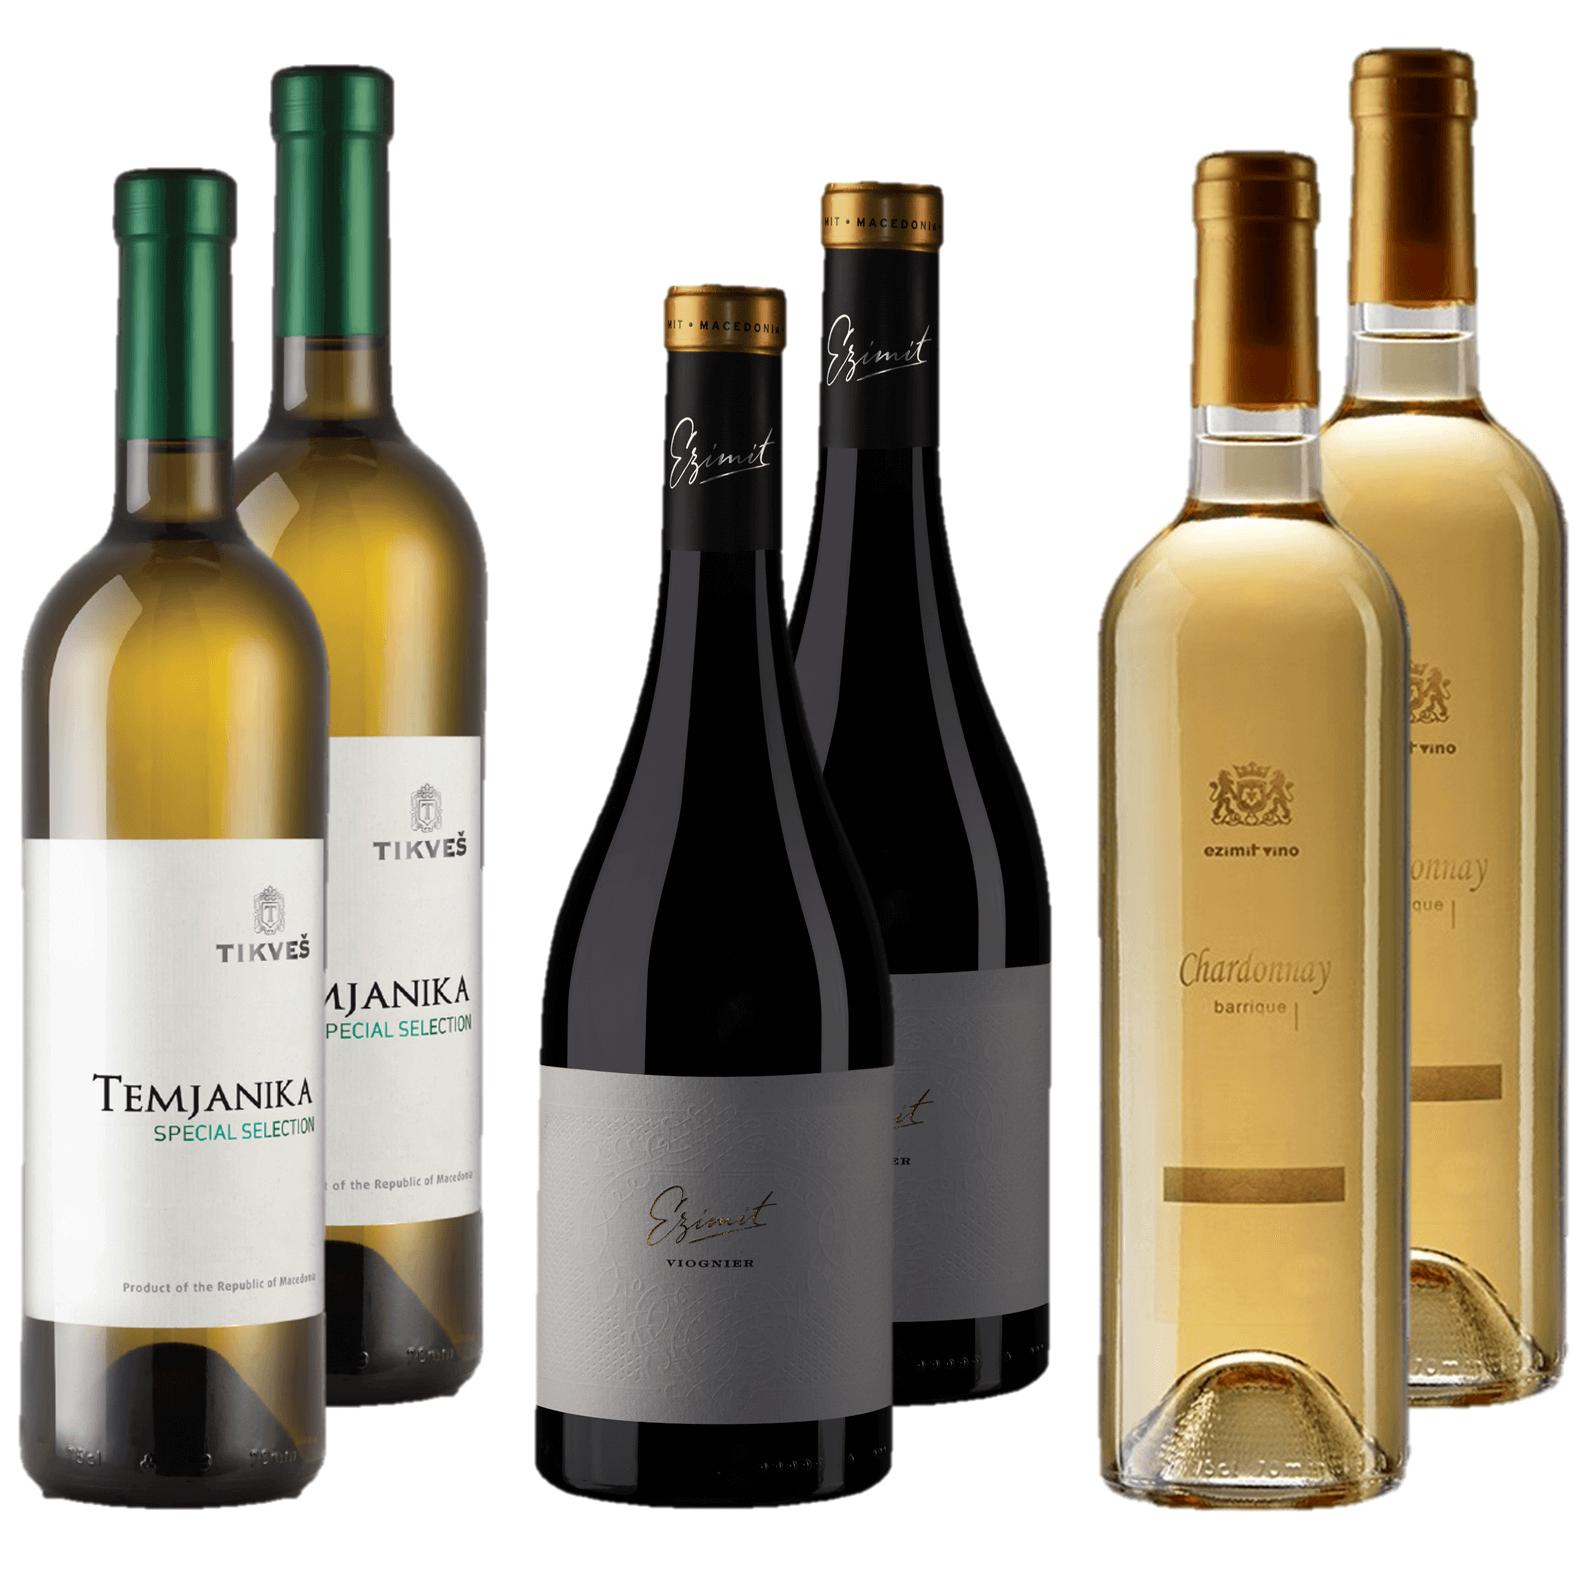 Chardonnay Viognier and Temjanika White wine bundle deal Singapore